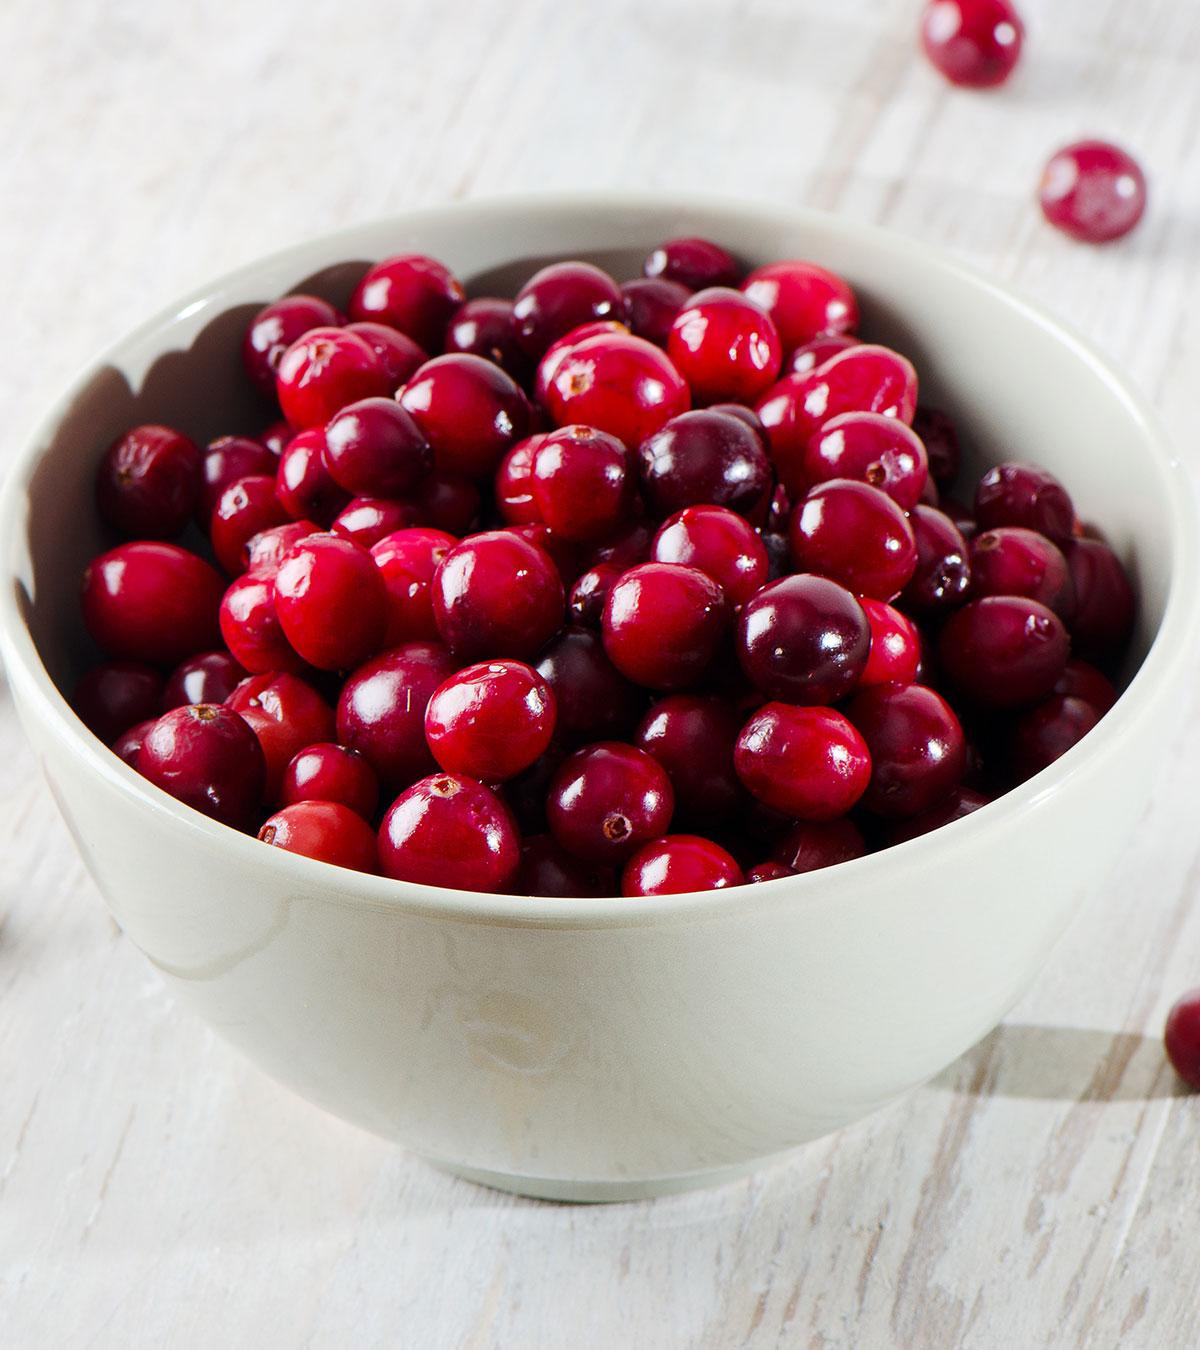 6 Amazing Health Benefits Of Cranberries For Kids